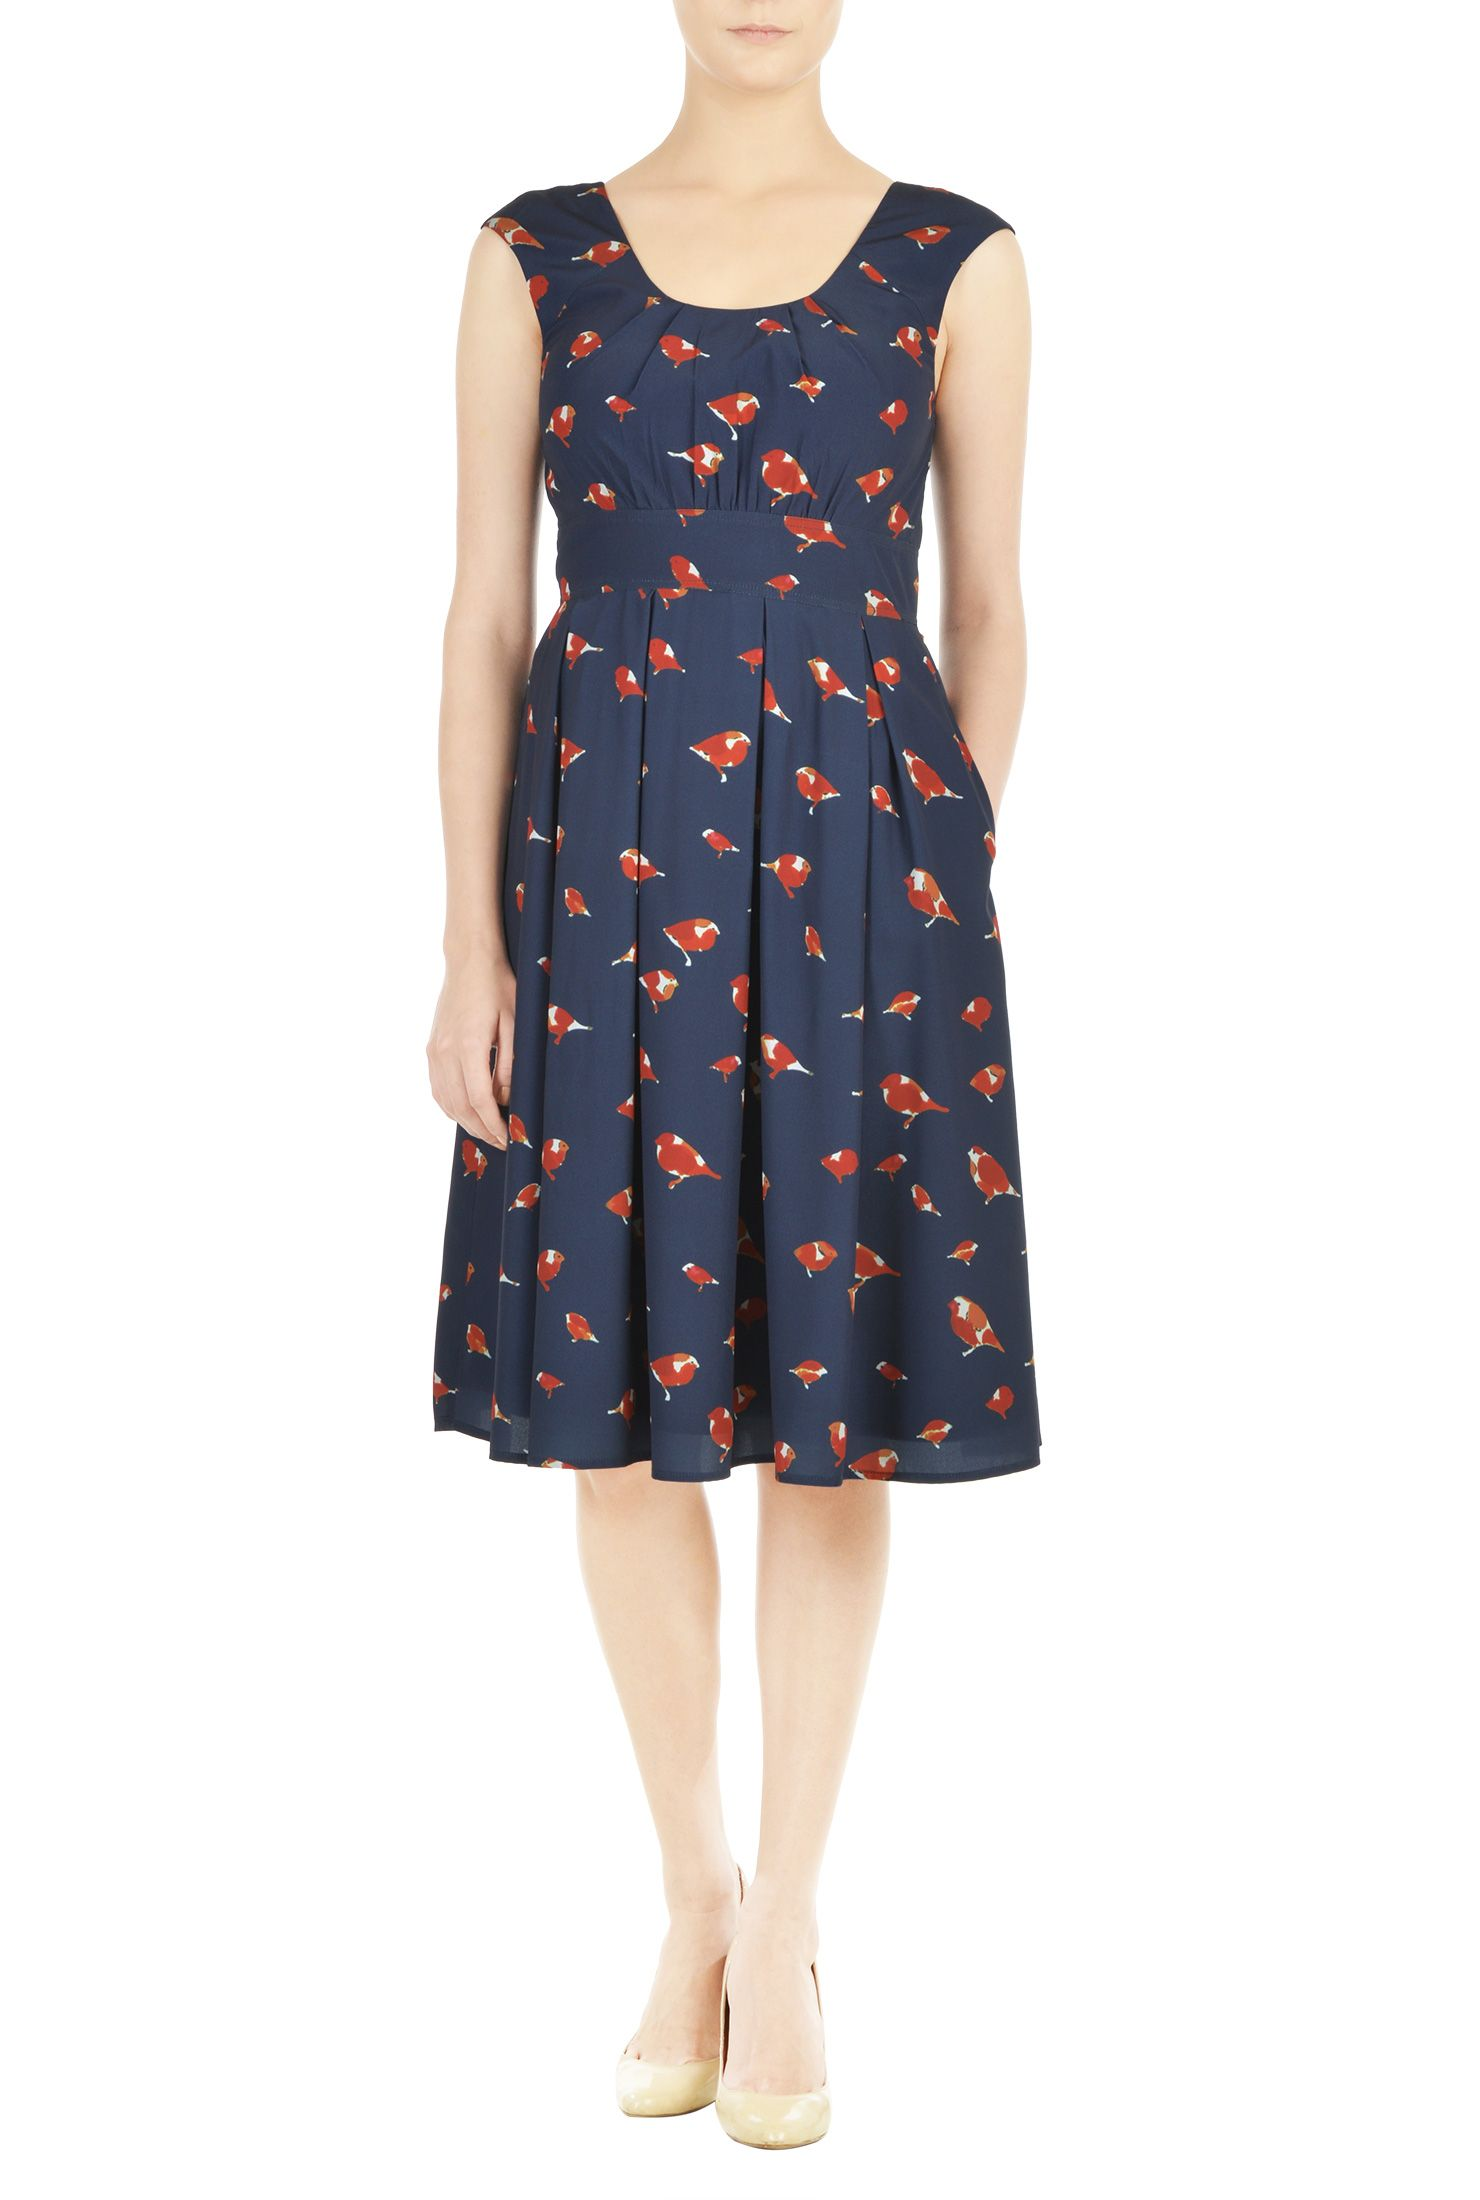 Below knee length dresses bird print dresses cap sleeve dresses